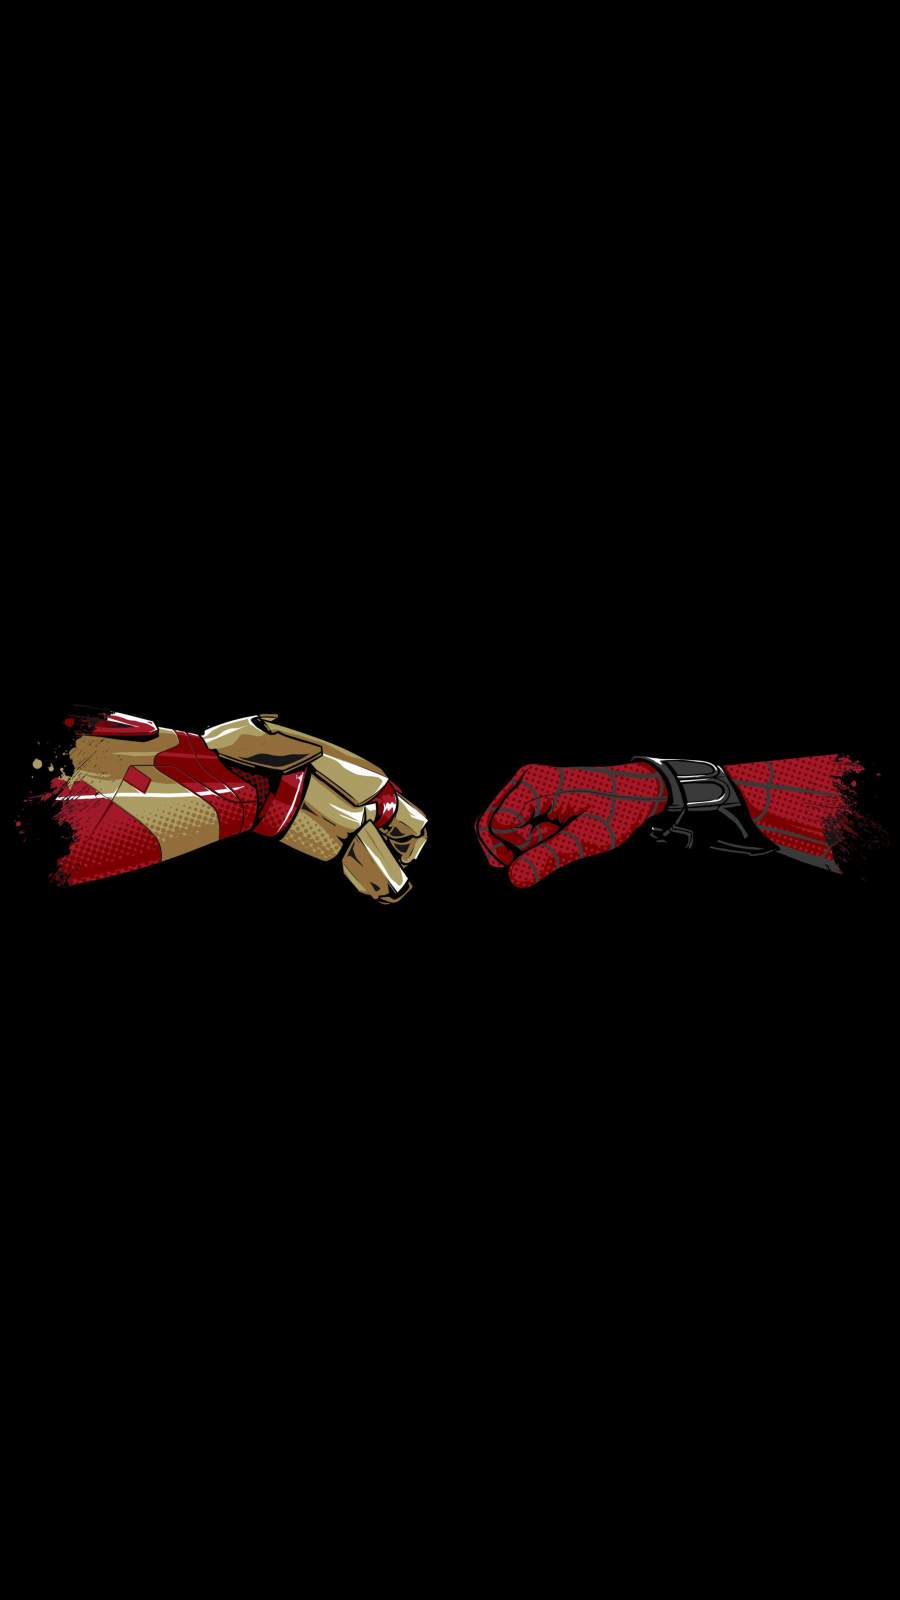 Iron Man and Spider Man